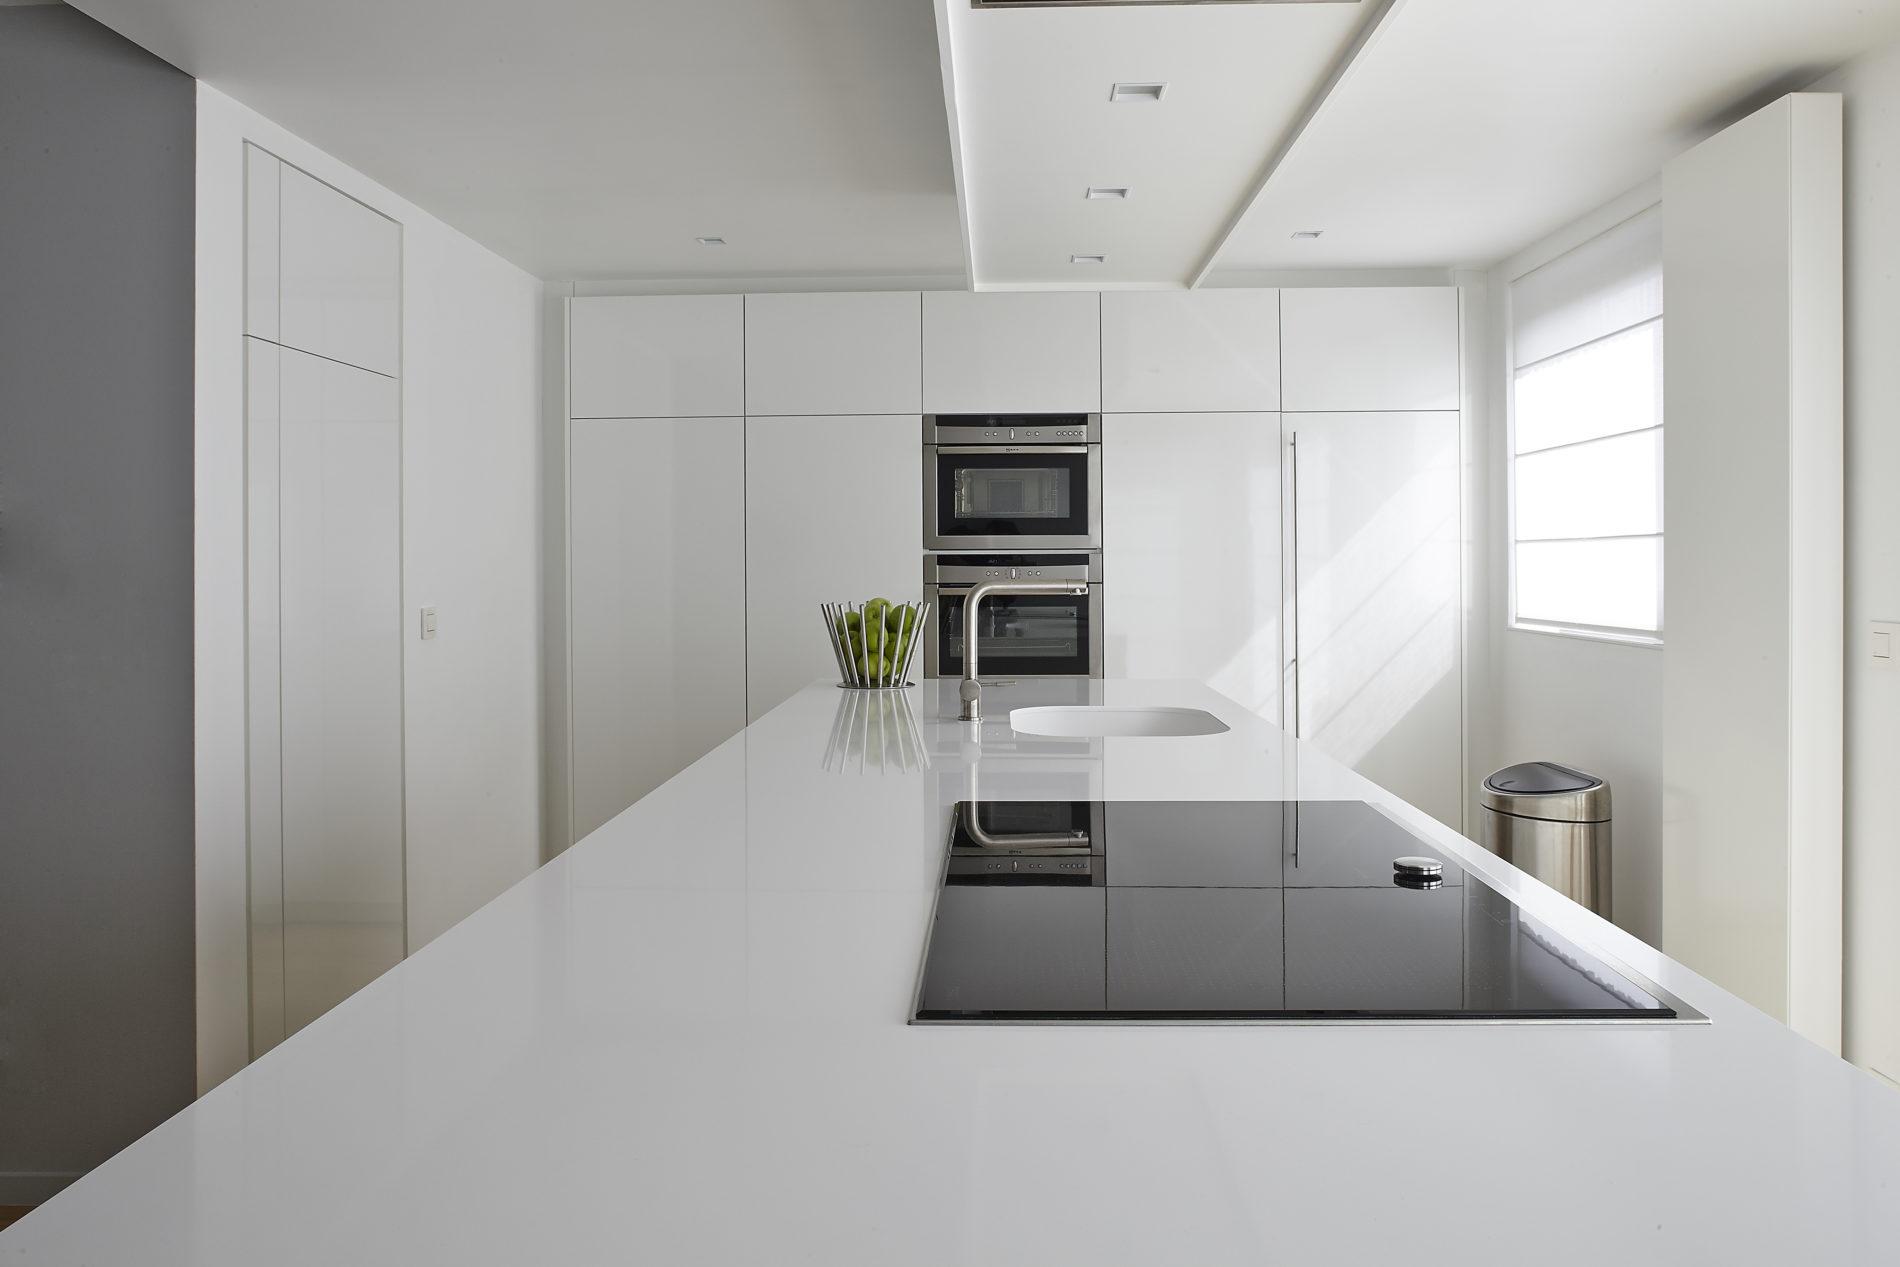 Arcoon architecten interieur renovatie binnenhuis architecten totaalproject interieur keuken